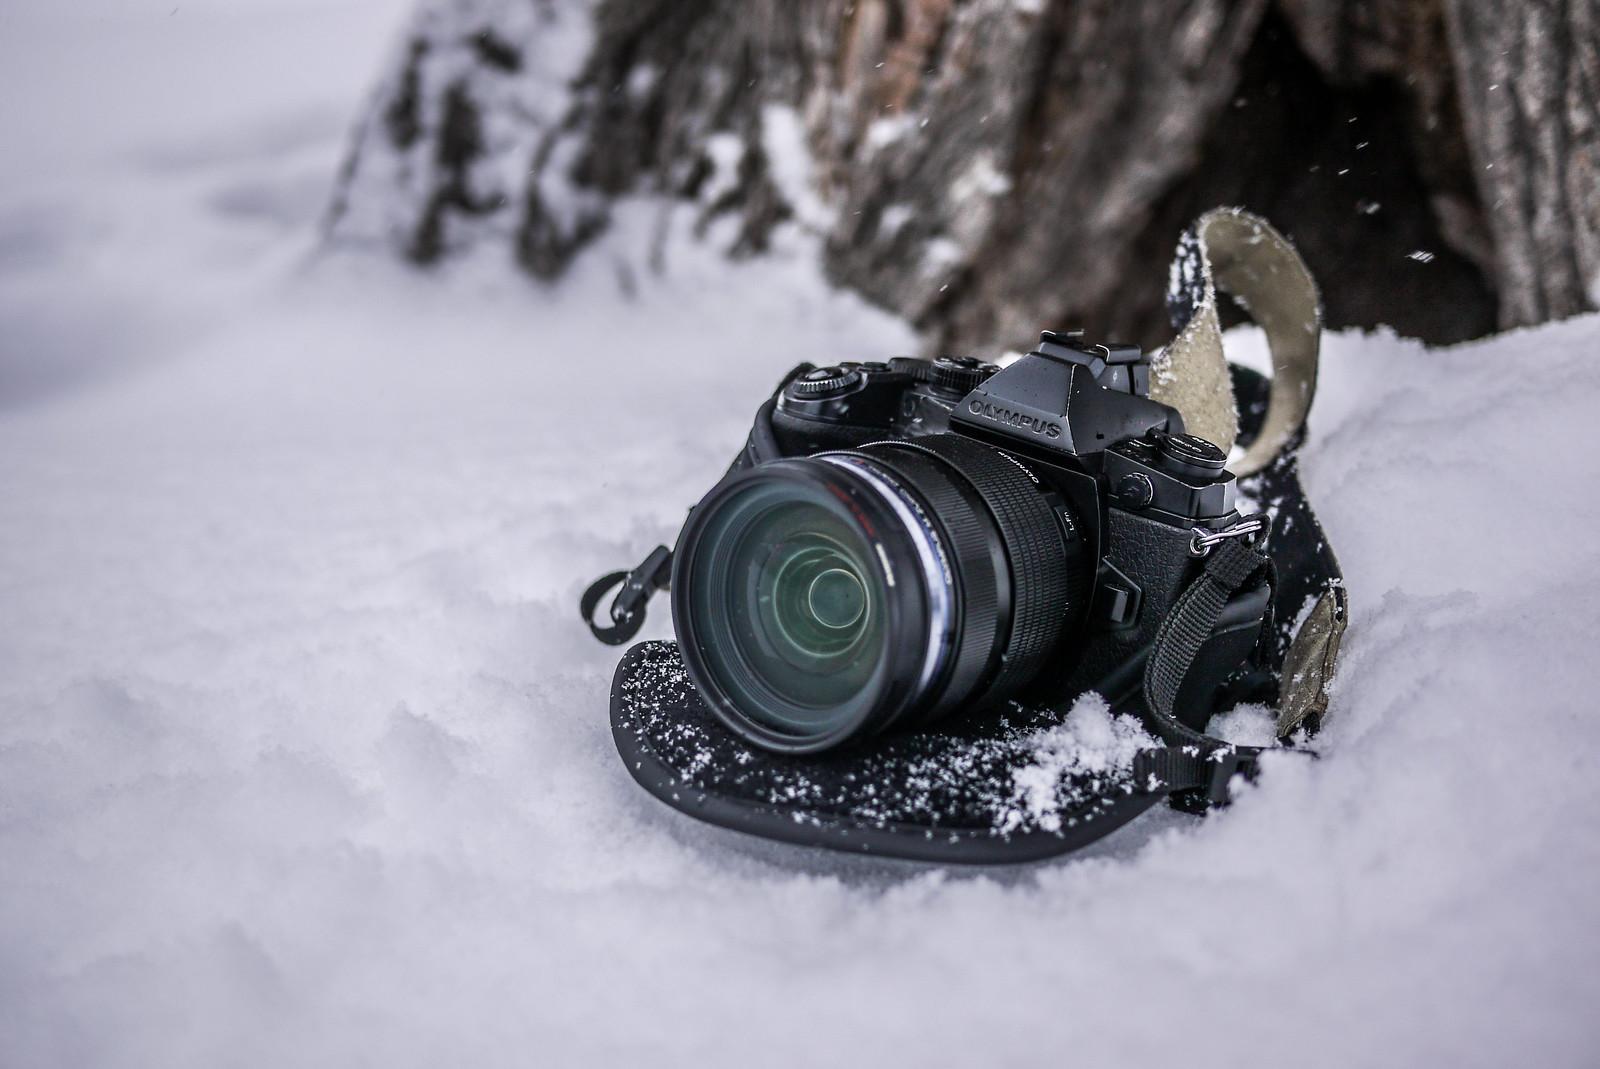 Olympus OM-D E-M1 in snow (Hokkaido, Japan)